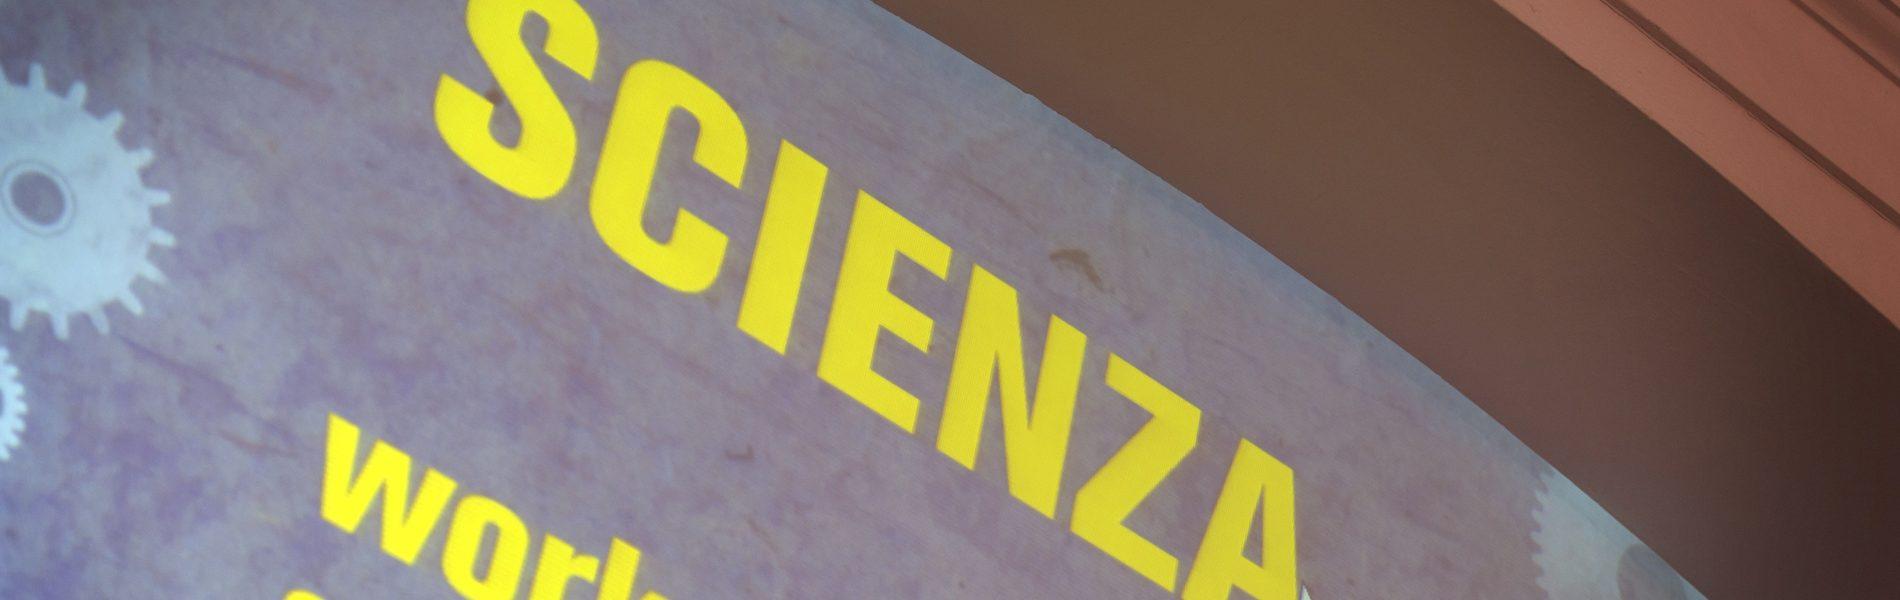 workshop_scienza